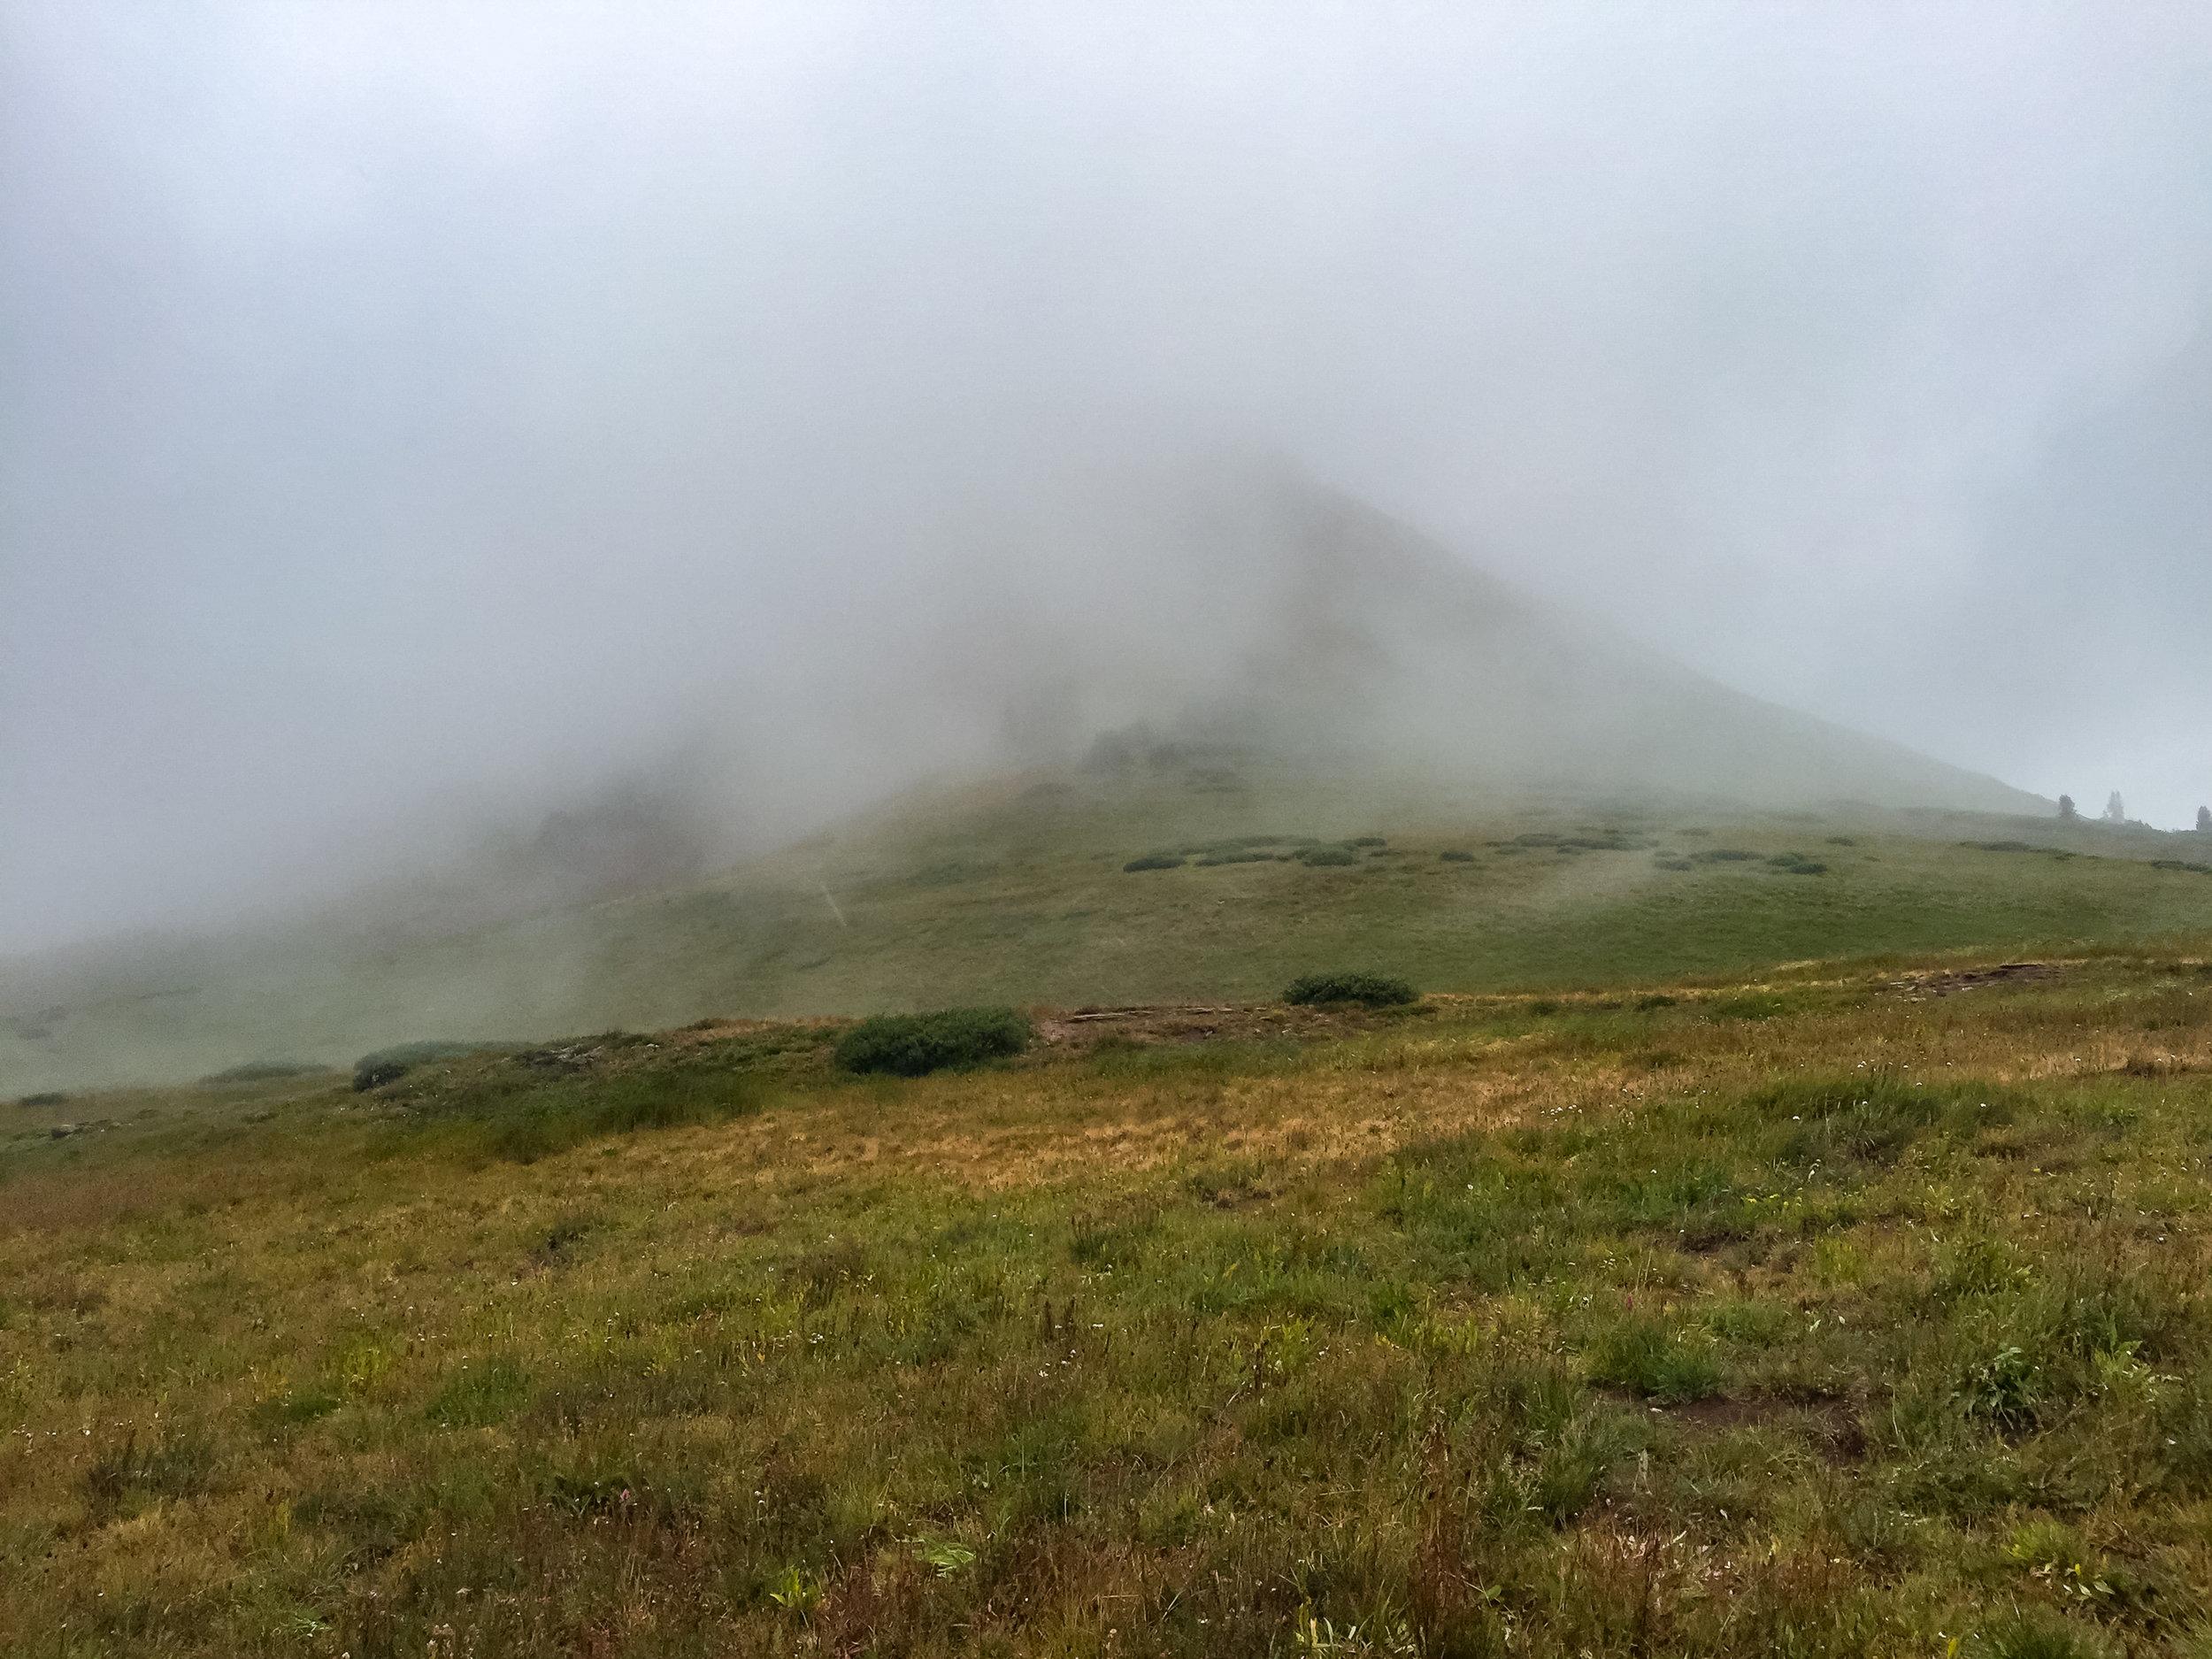 Fog engulfing Engineer Mountain